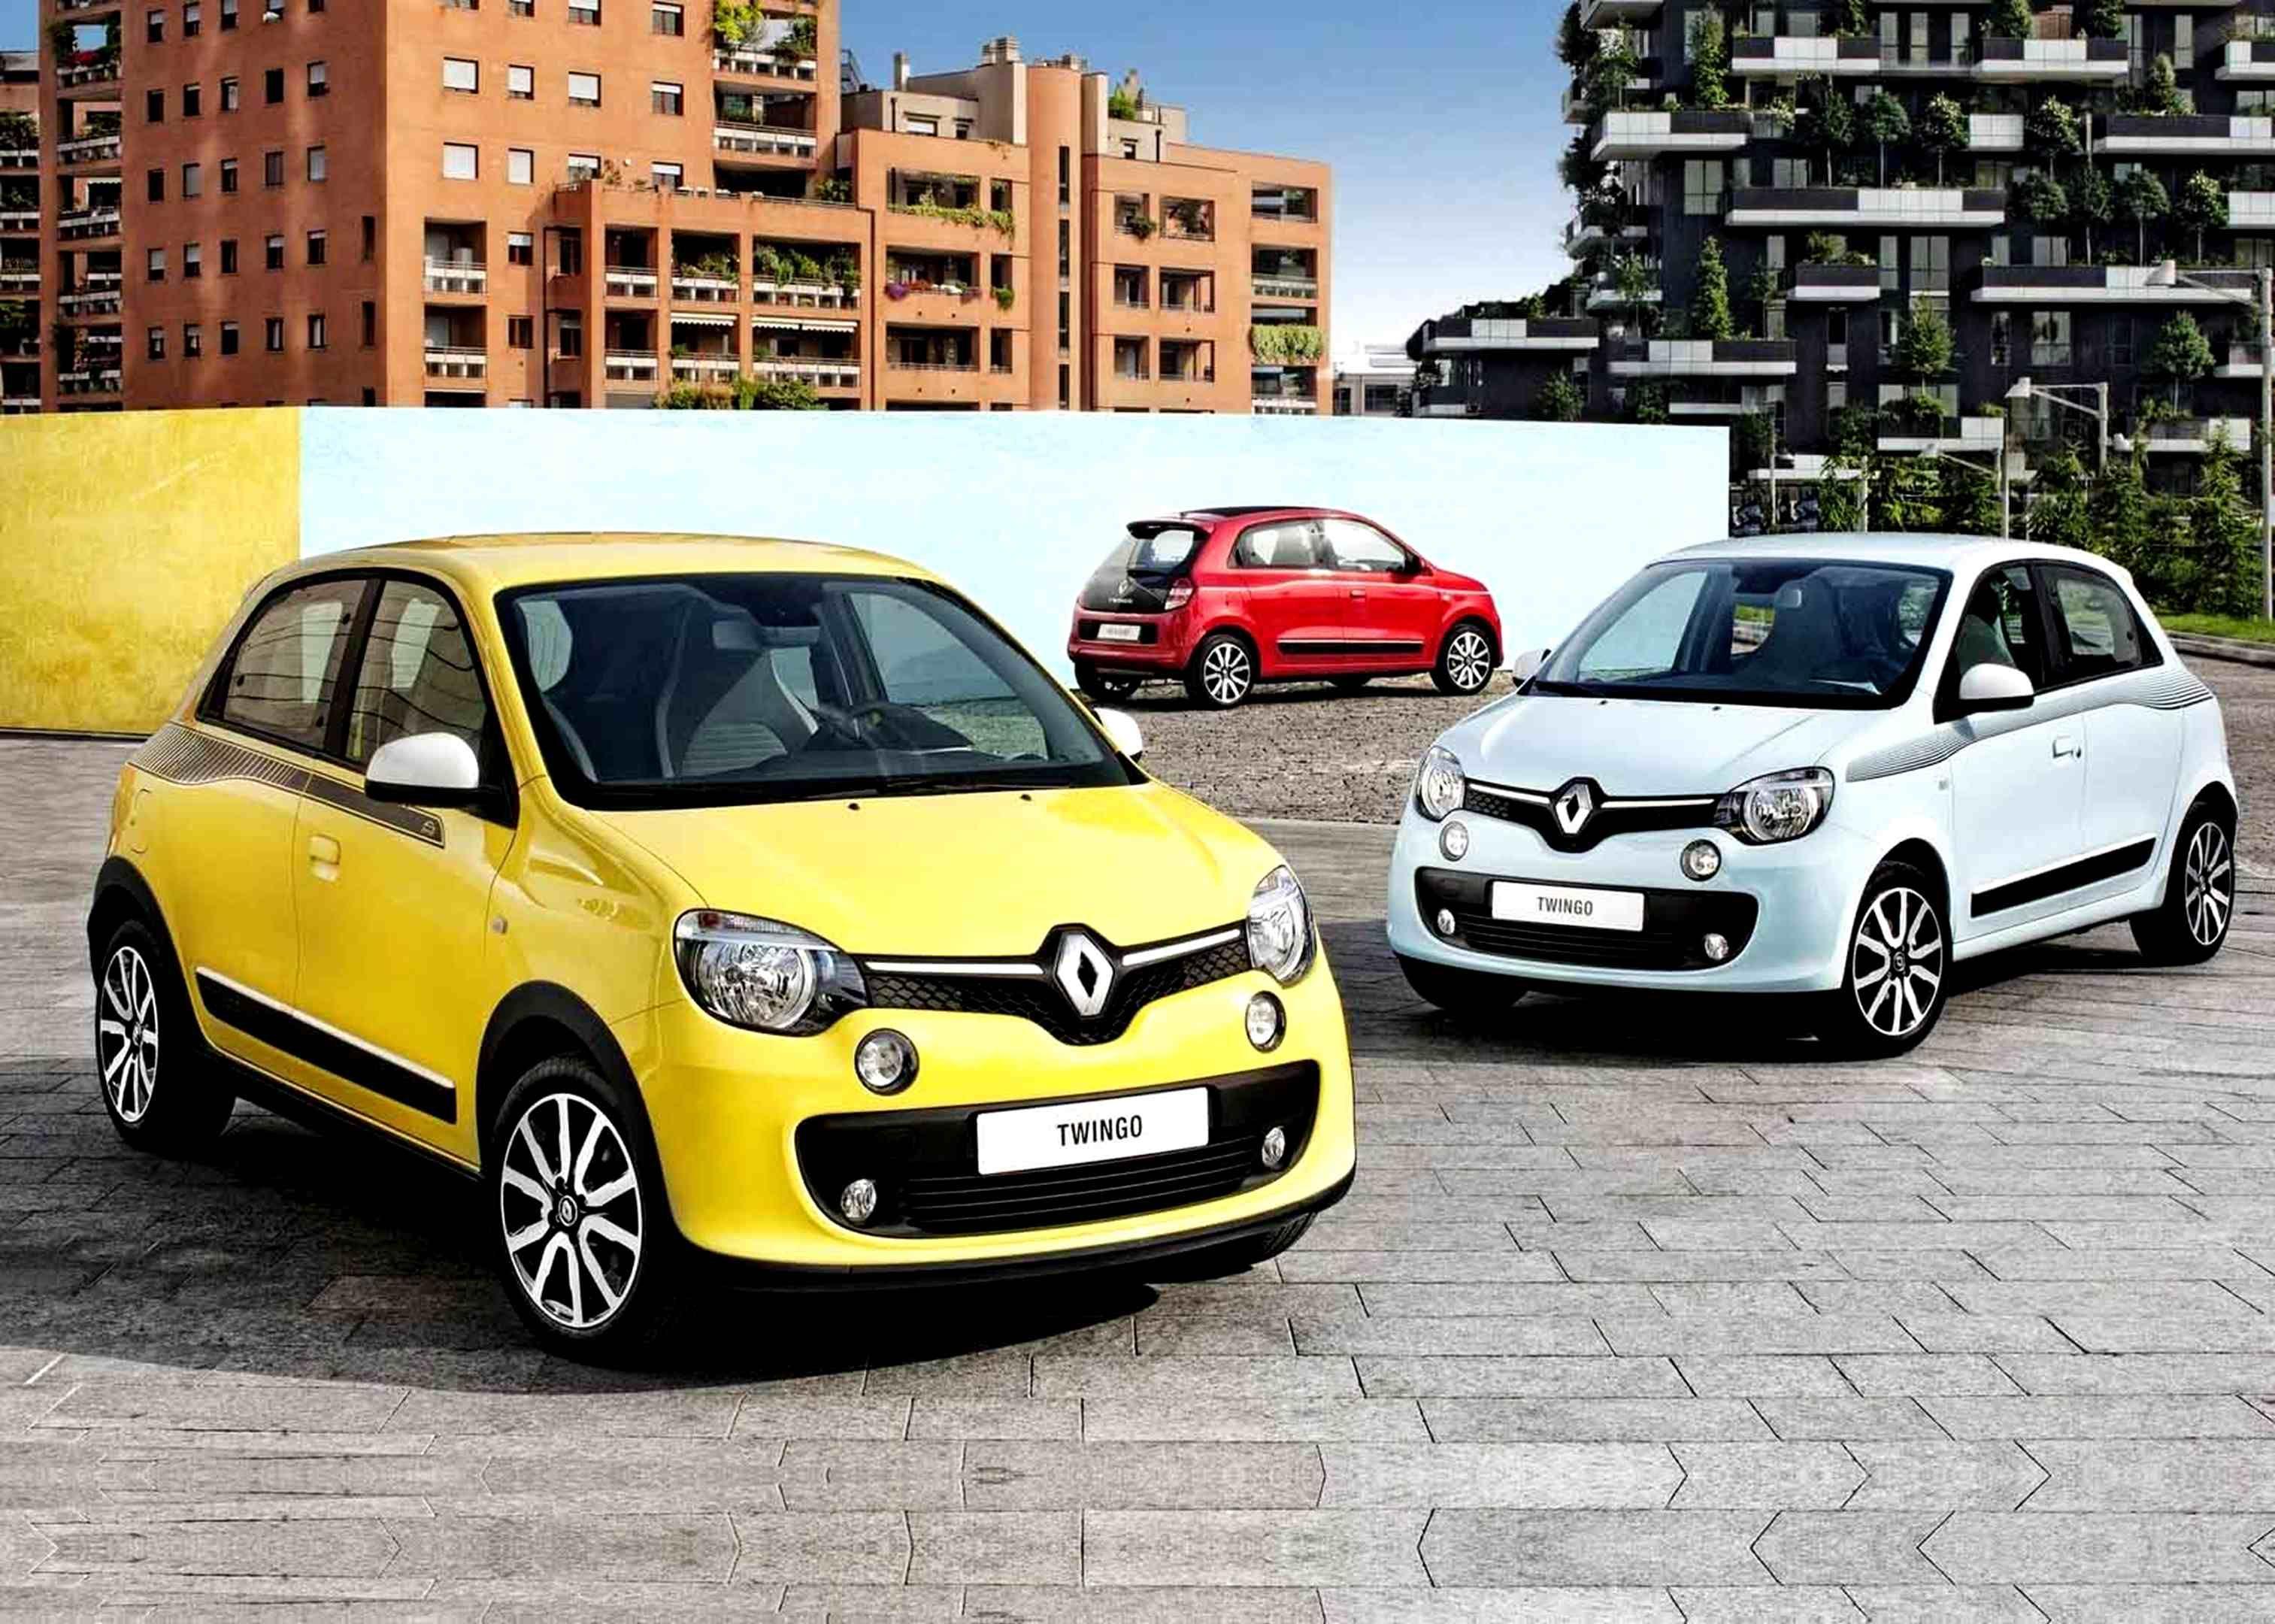 2015 Renault Twingo Car Wallpapers 2015 Renault Twingo Renault